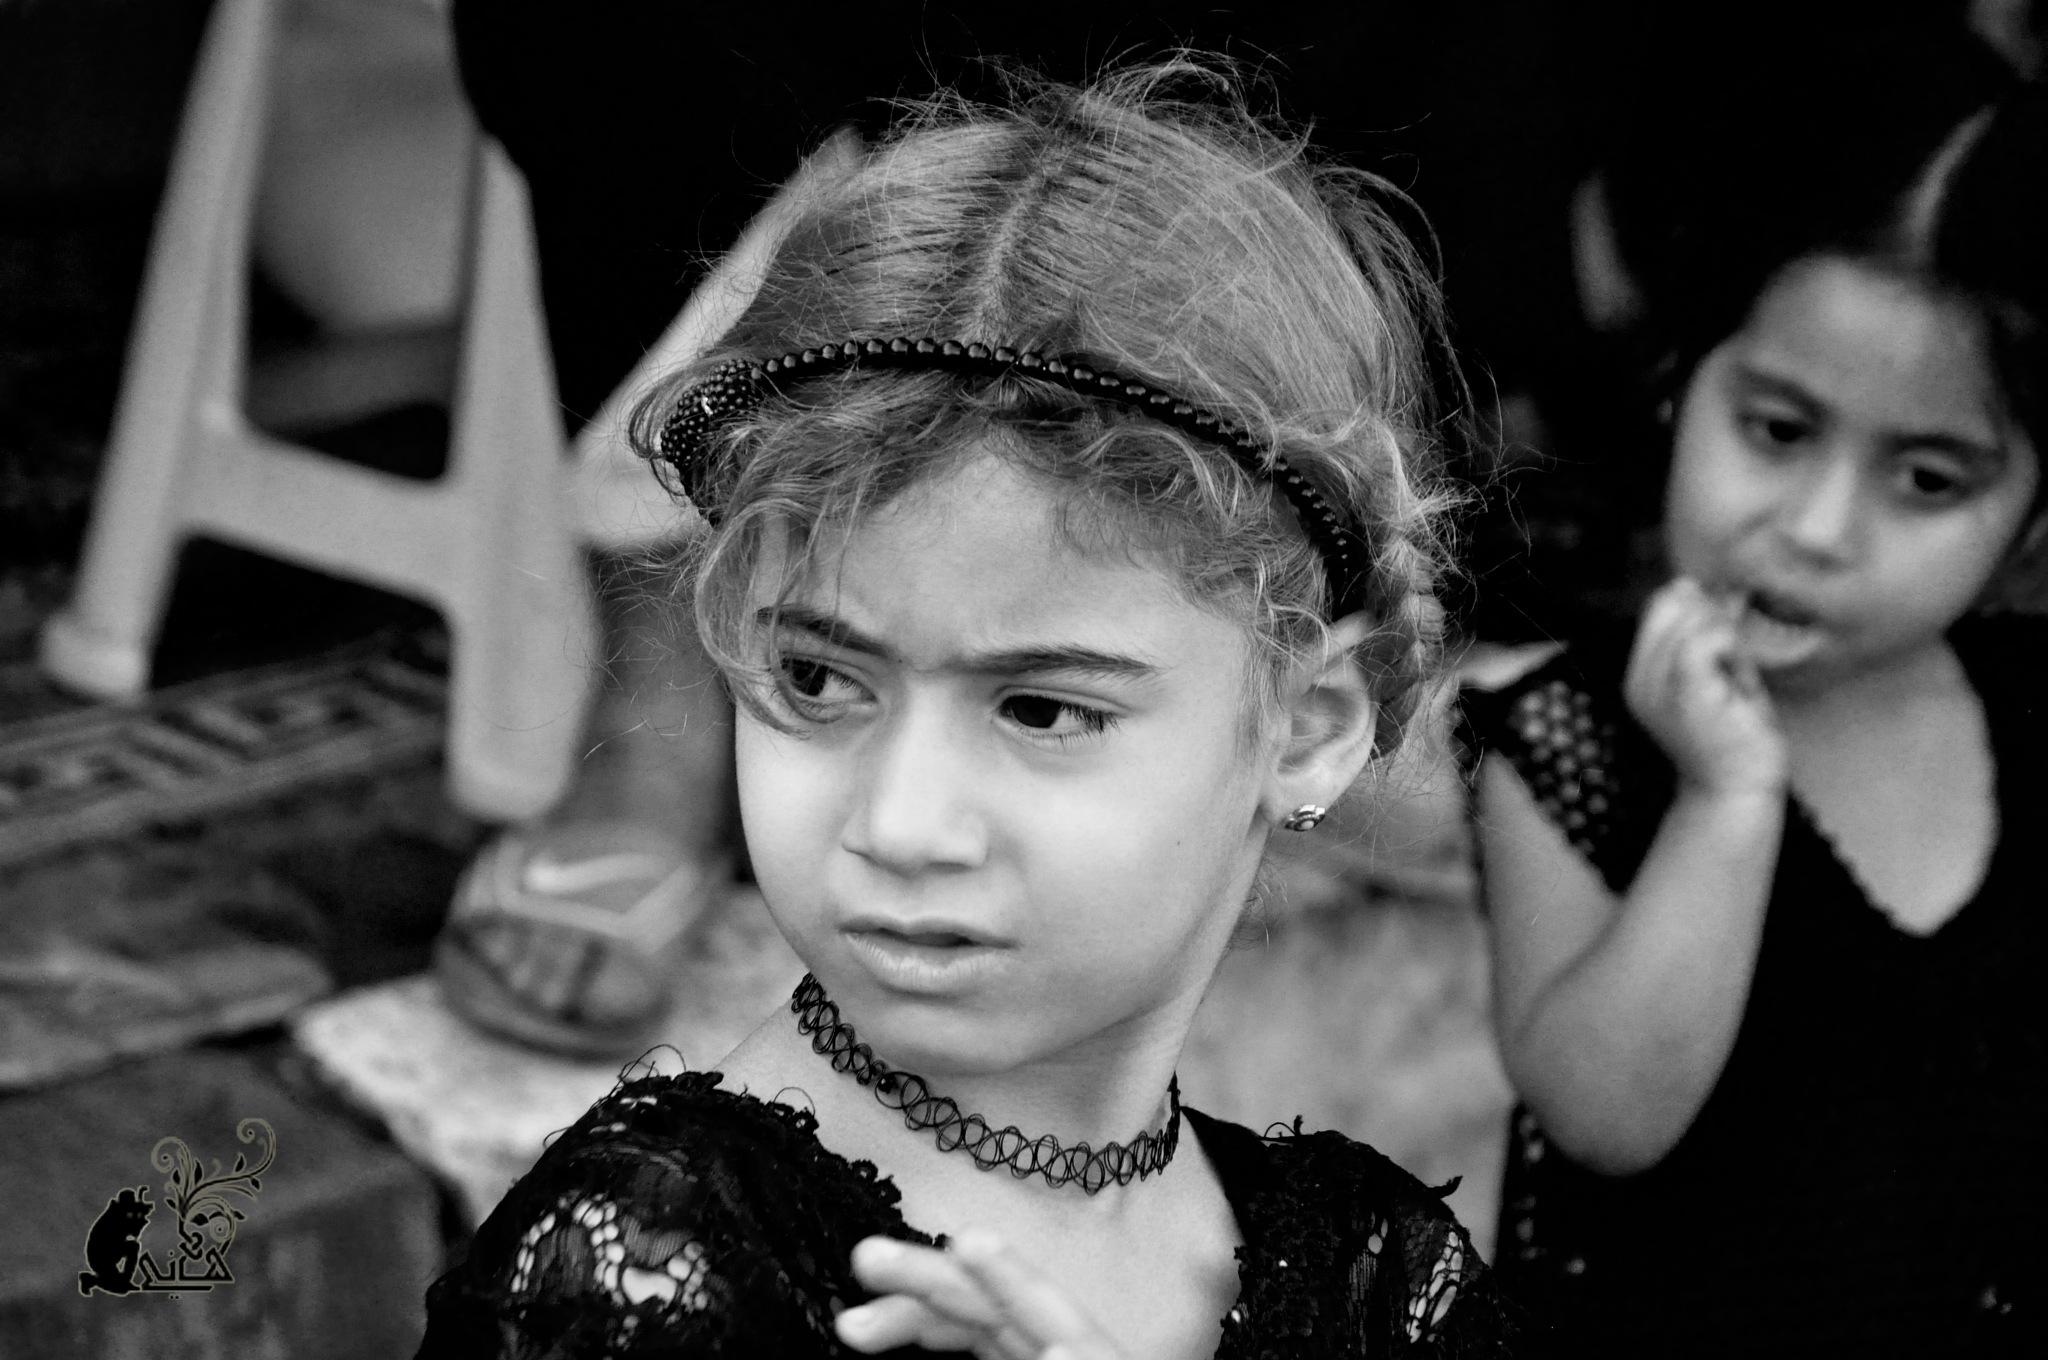 Untitled by ابو مهدي الجبوري Hani